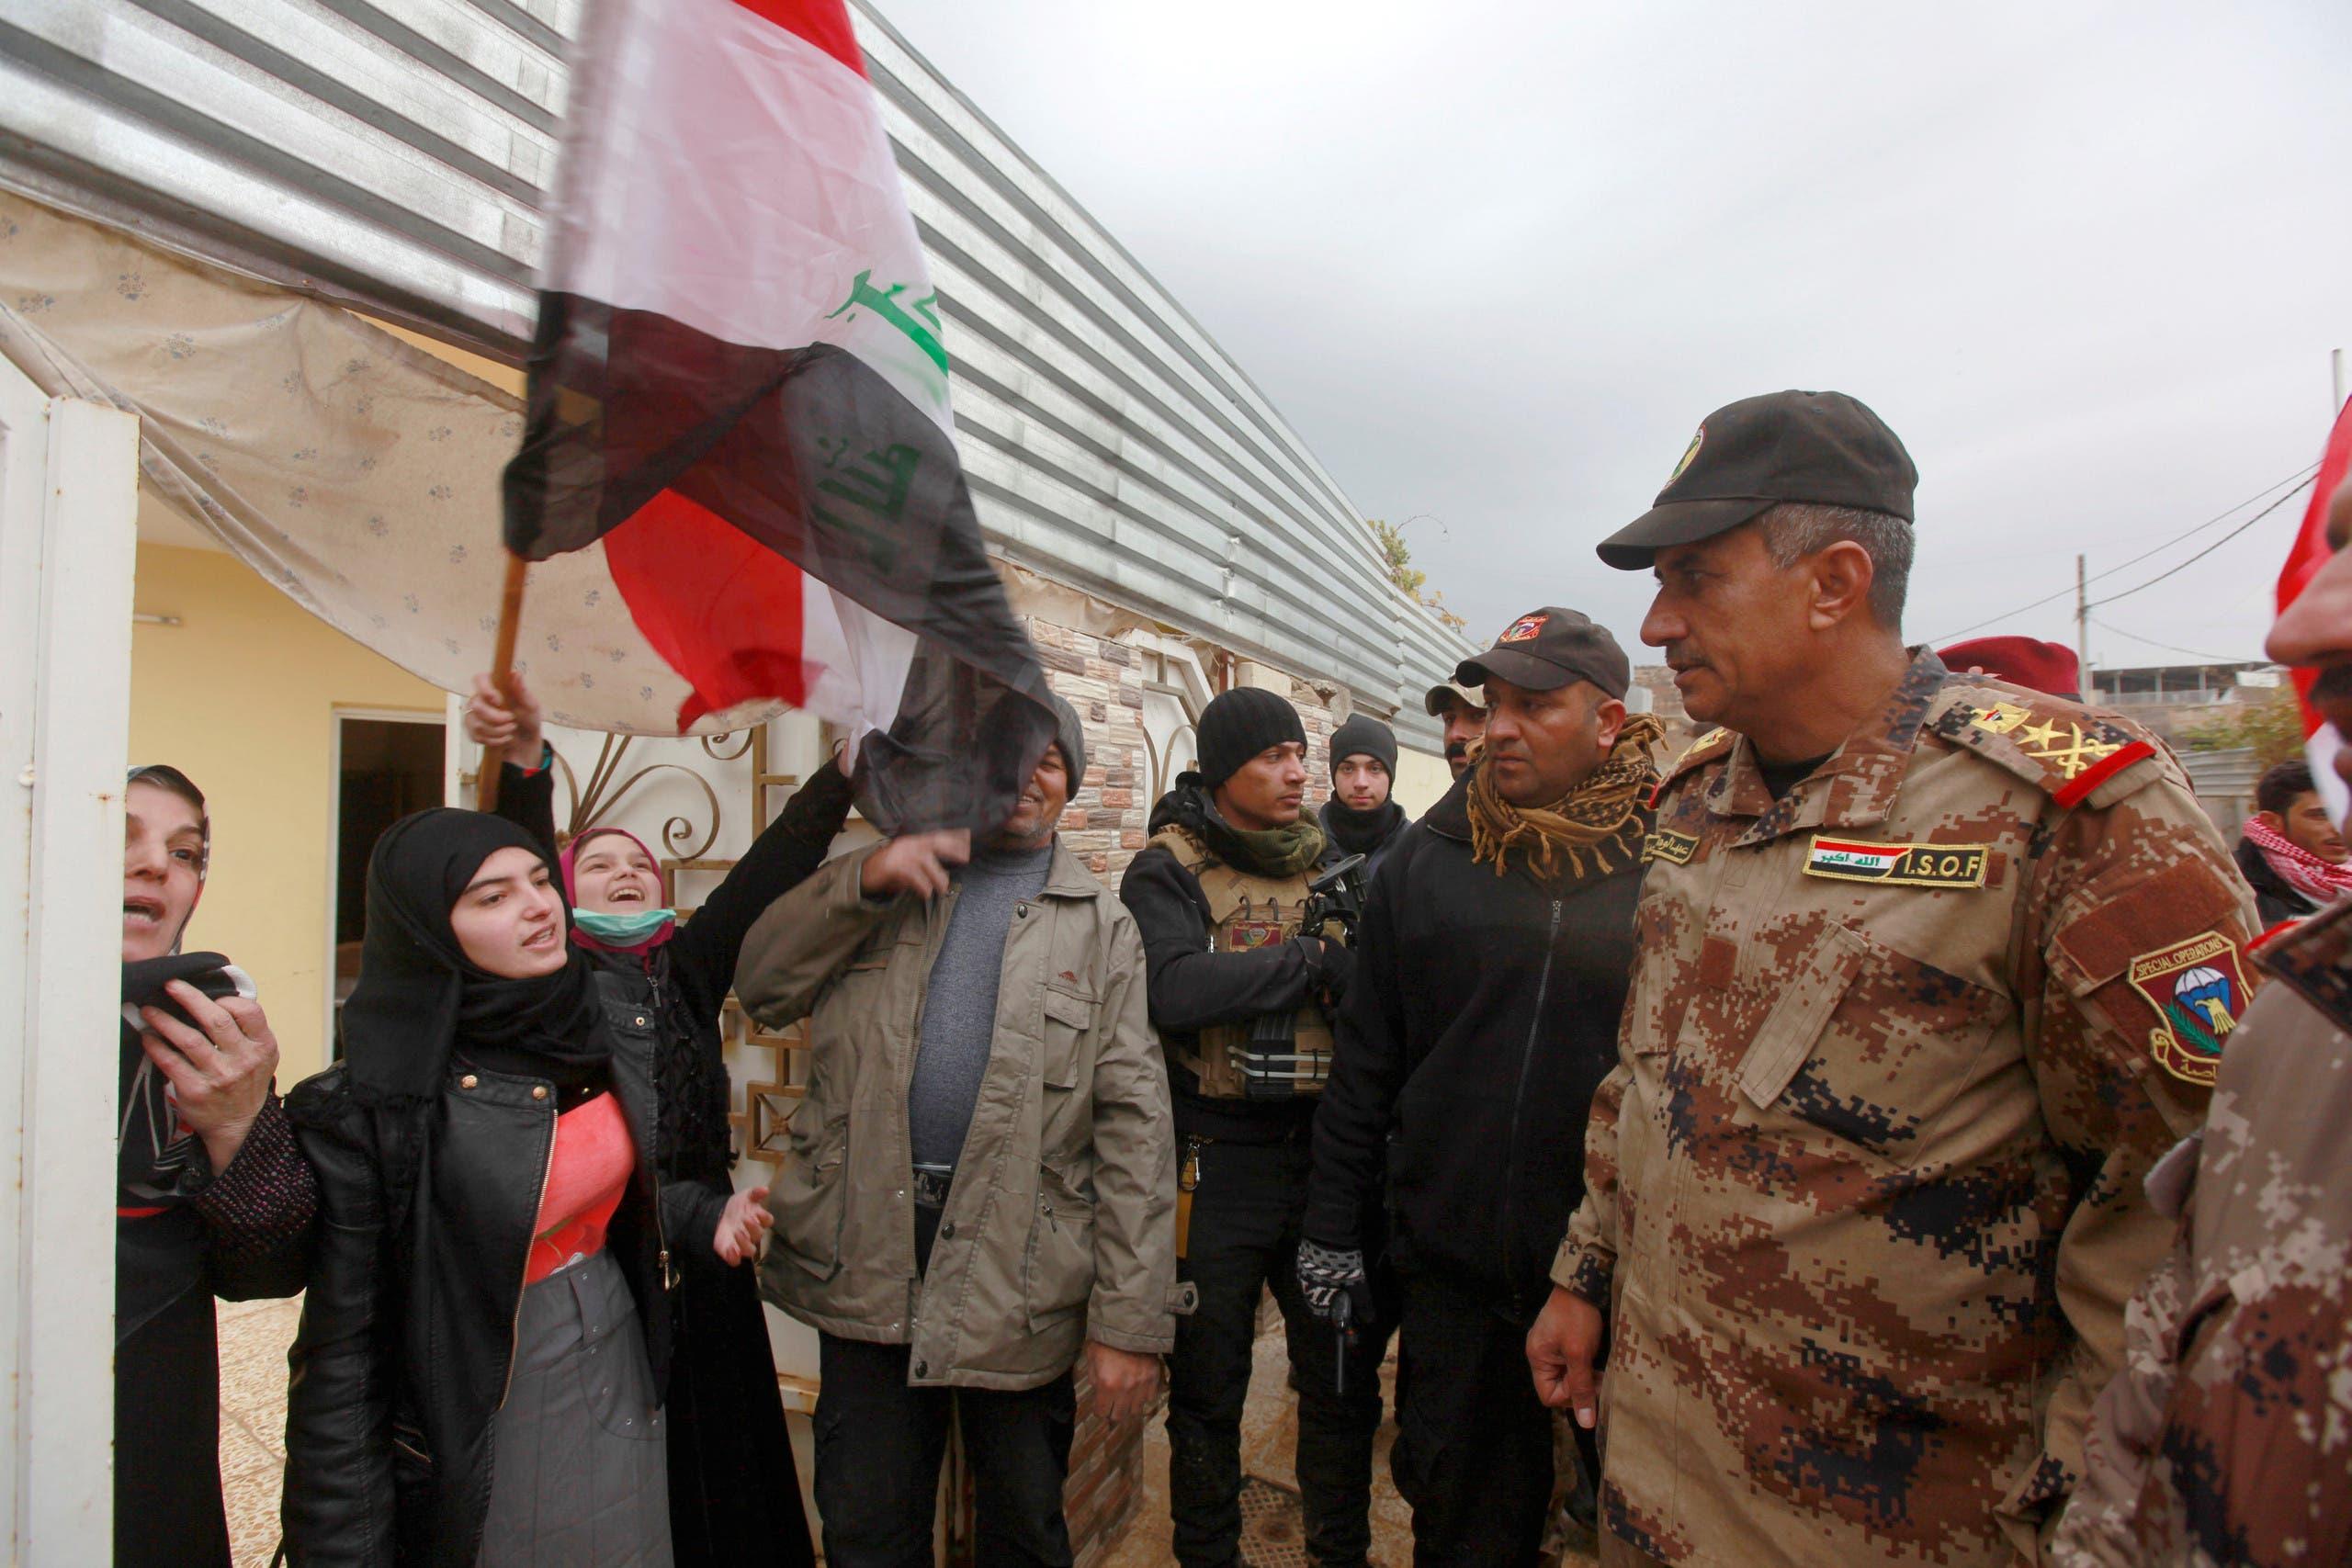 Lieutenant General Abdel Wahab al-Saadi (R) greets people as they celebrate in Qadisiyah neighborhood north of Mosul, Iraq, December 14, 2016. REUTERS/Alaa Al-Marjani